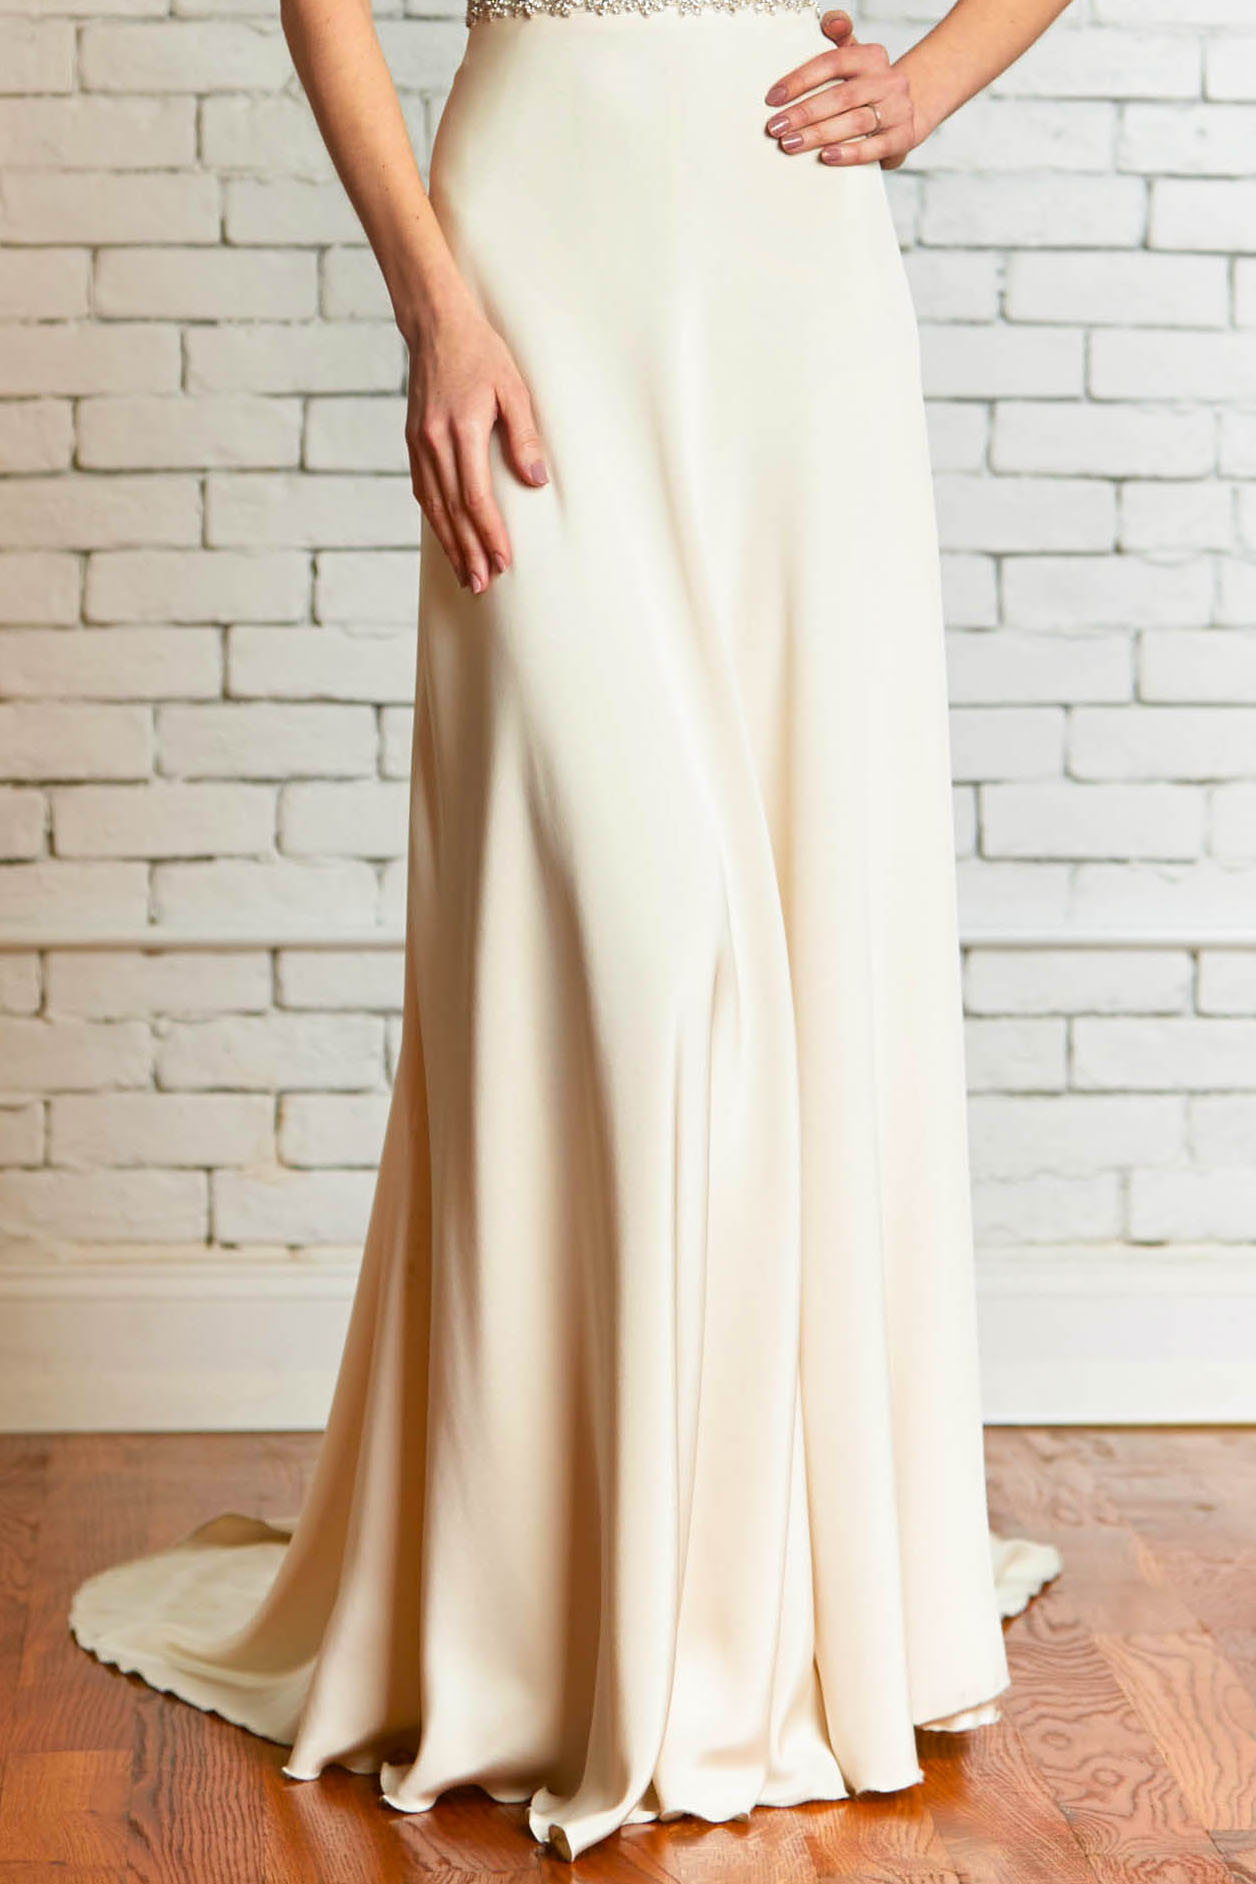 Grace-skirt_A-line_Modern_Simple_Bridal_Separates.jpg